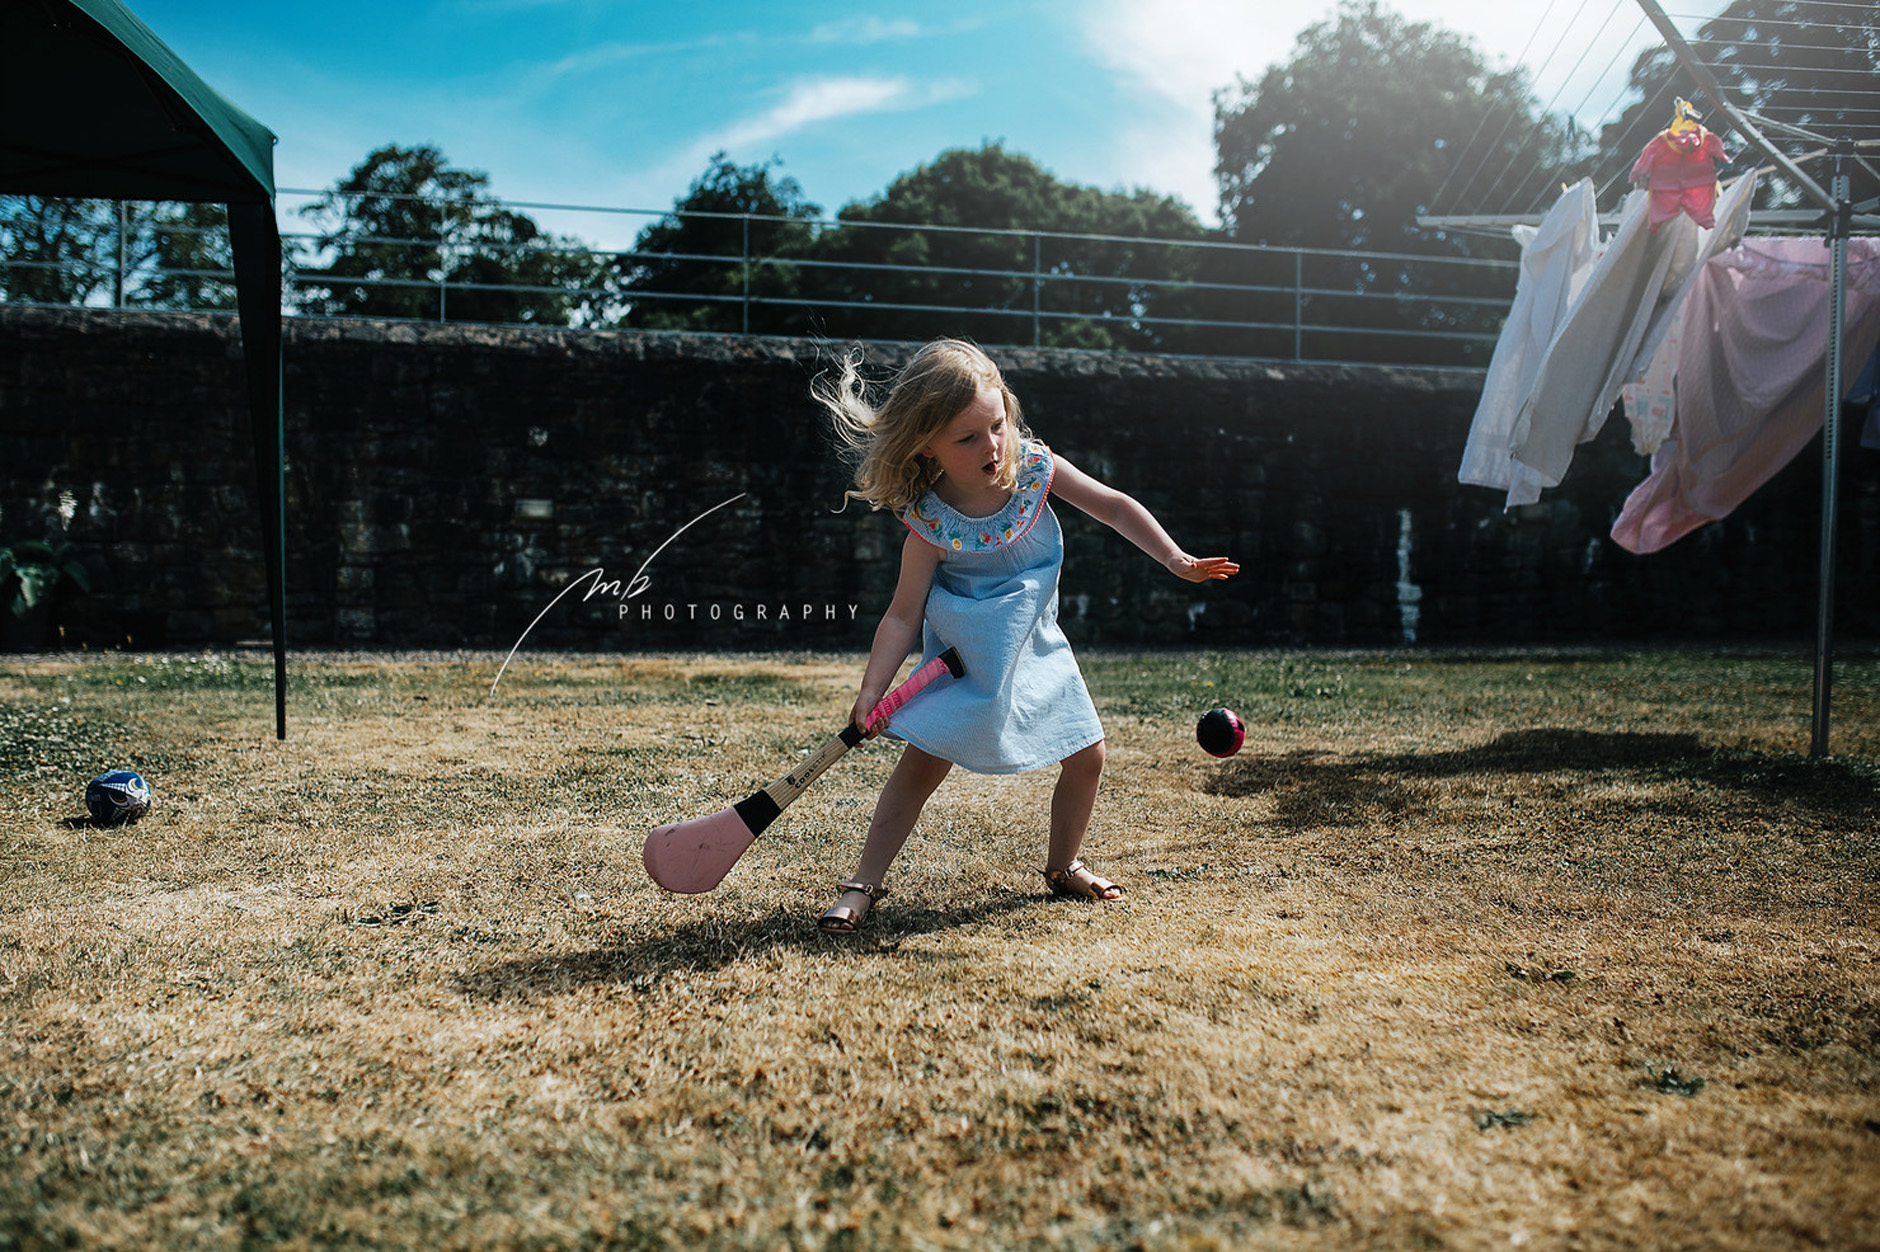 candid-natural-children-family-photographer-dublin-0141.jpg